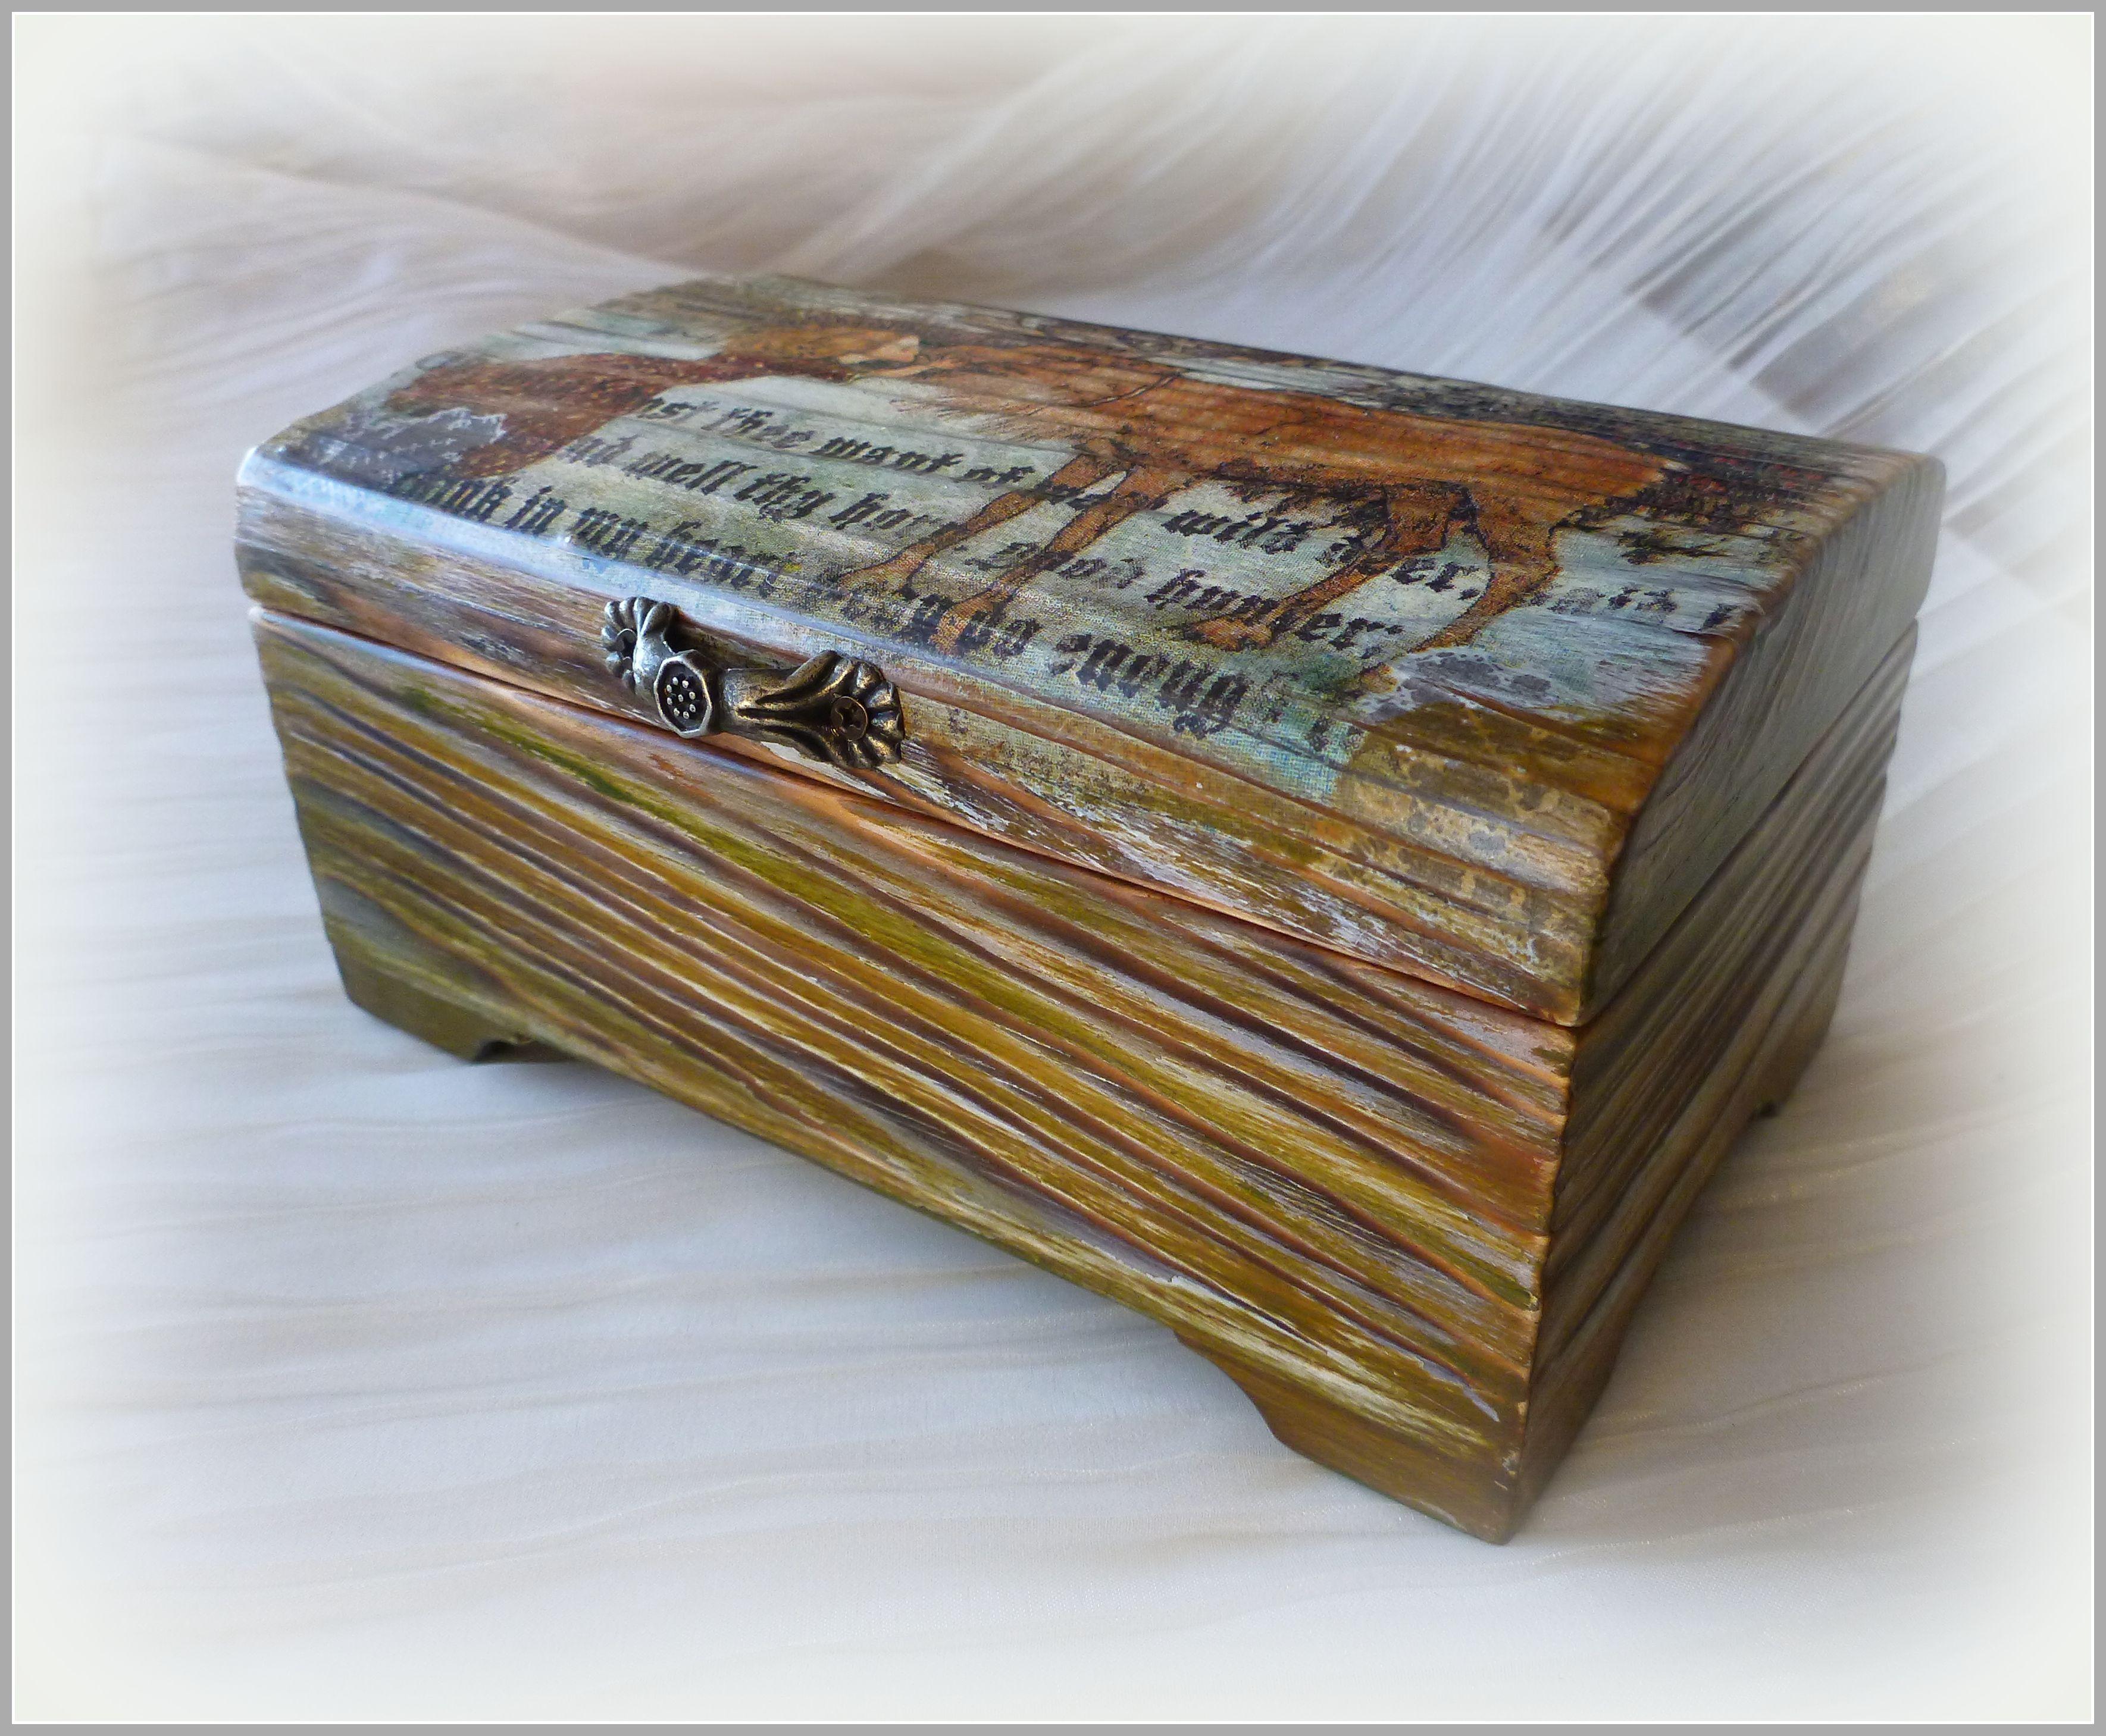 шкатулкадекупаж зеленый новыйгод коричневый новогодний коробка снежнаякоролева длямелочей сундучок сундук дляхранения 2017 шкатулкакупить деревяннаяшкатулка декупаж шкатулка дляукрашений короб винтаж